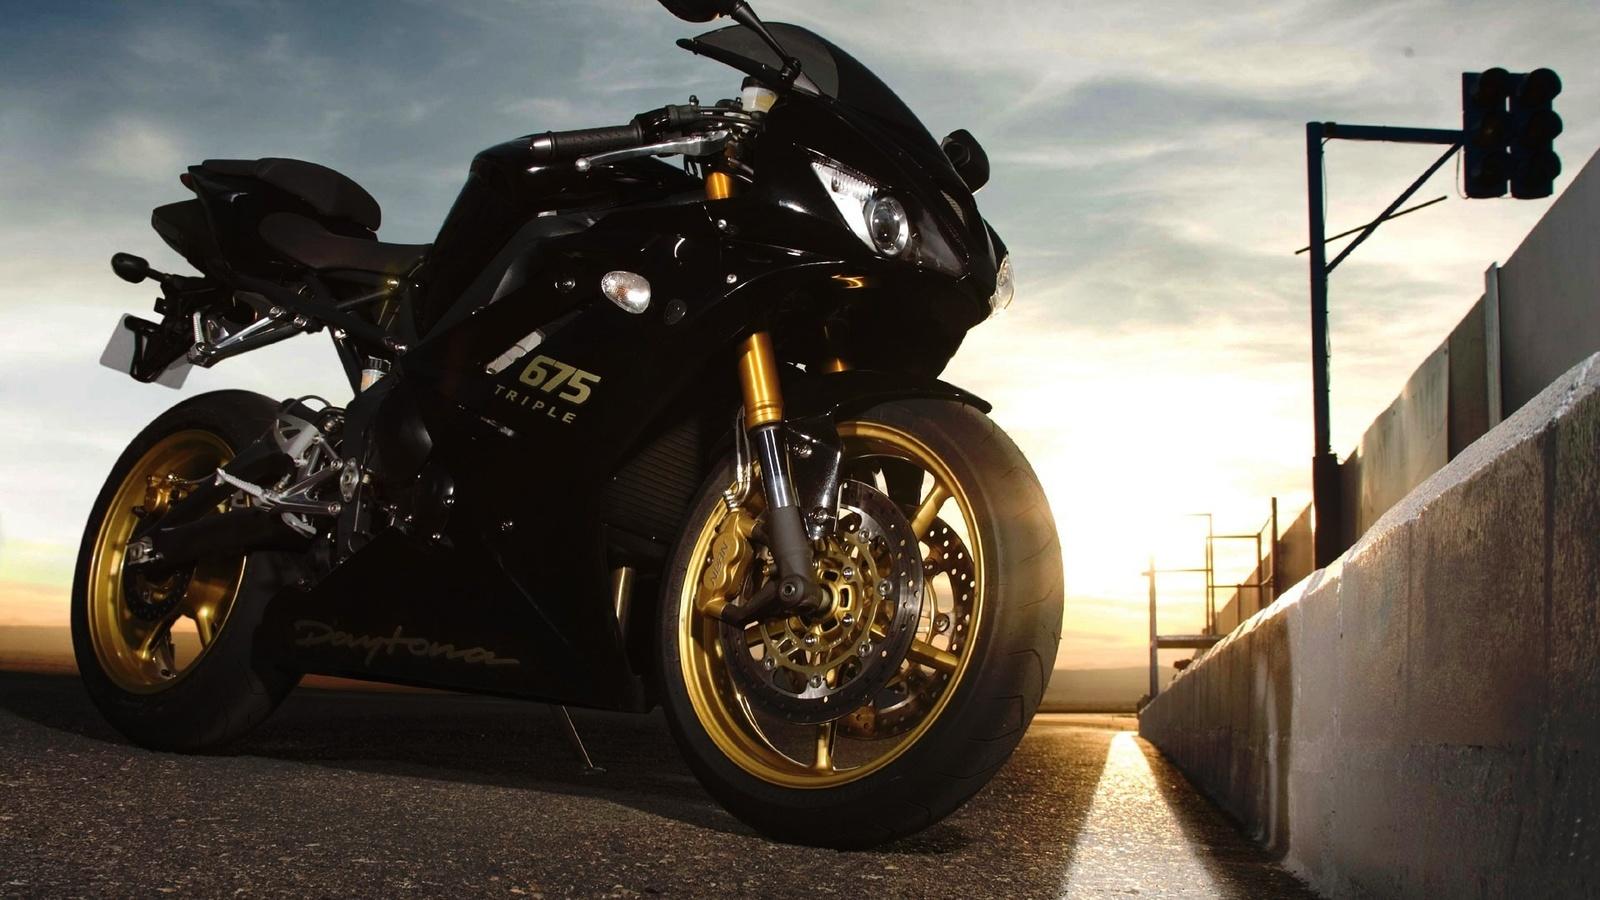 Картинки мотоциклов крутые